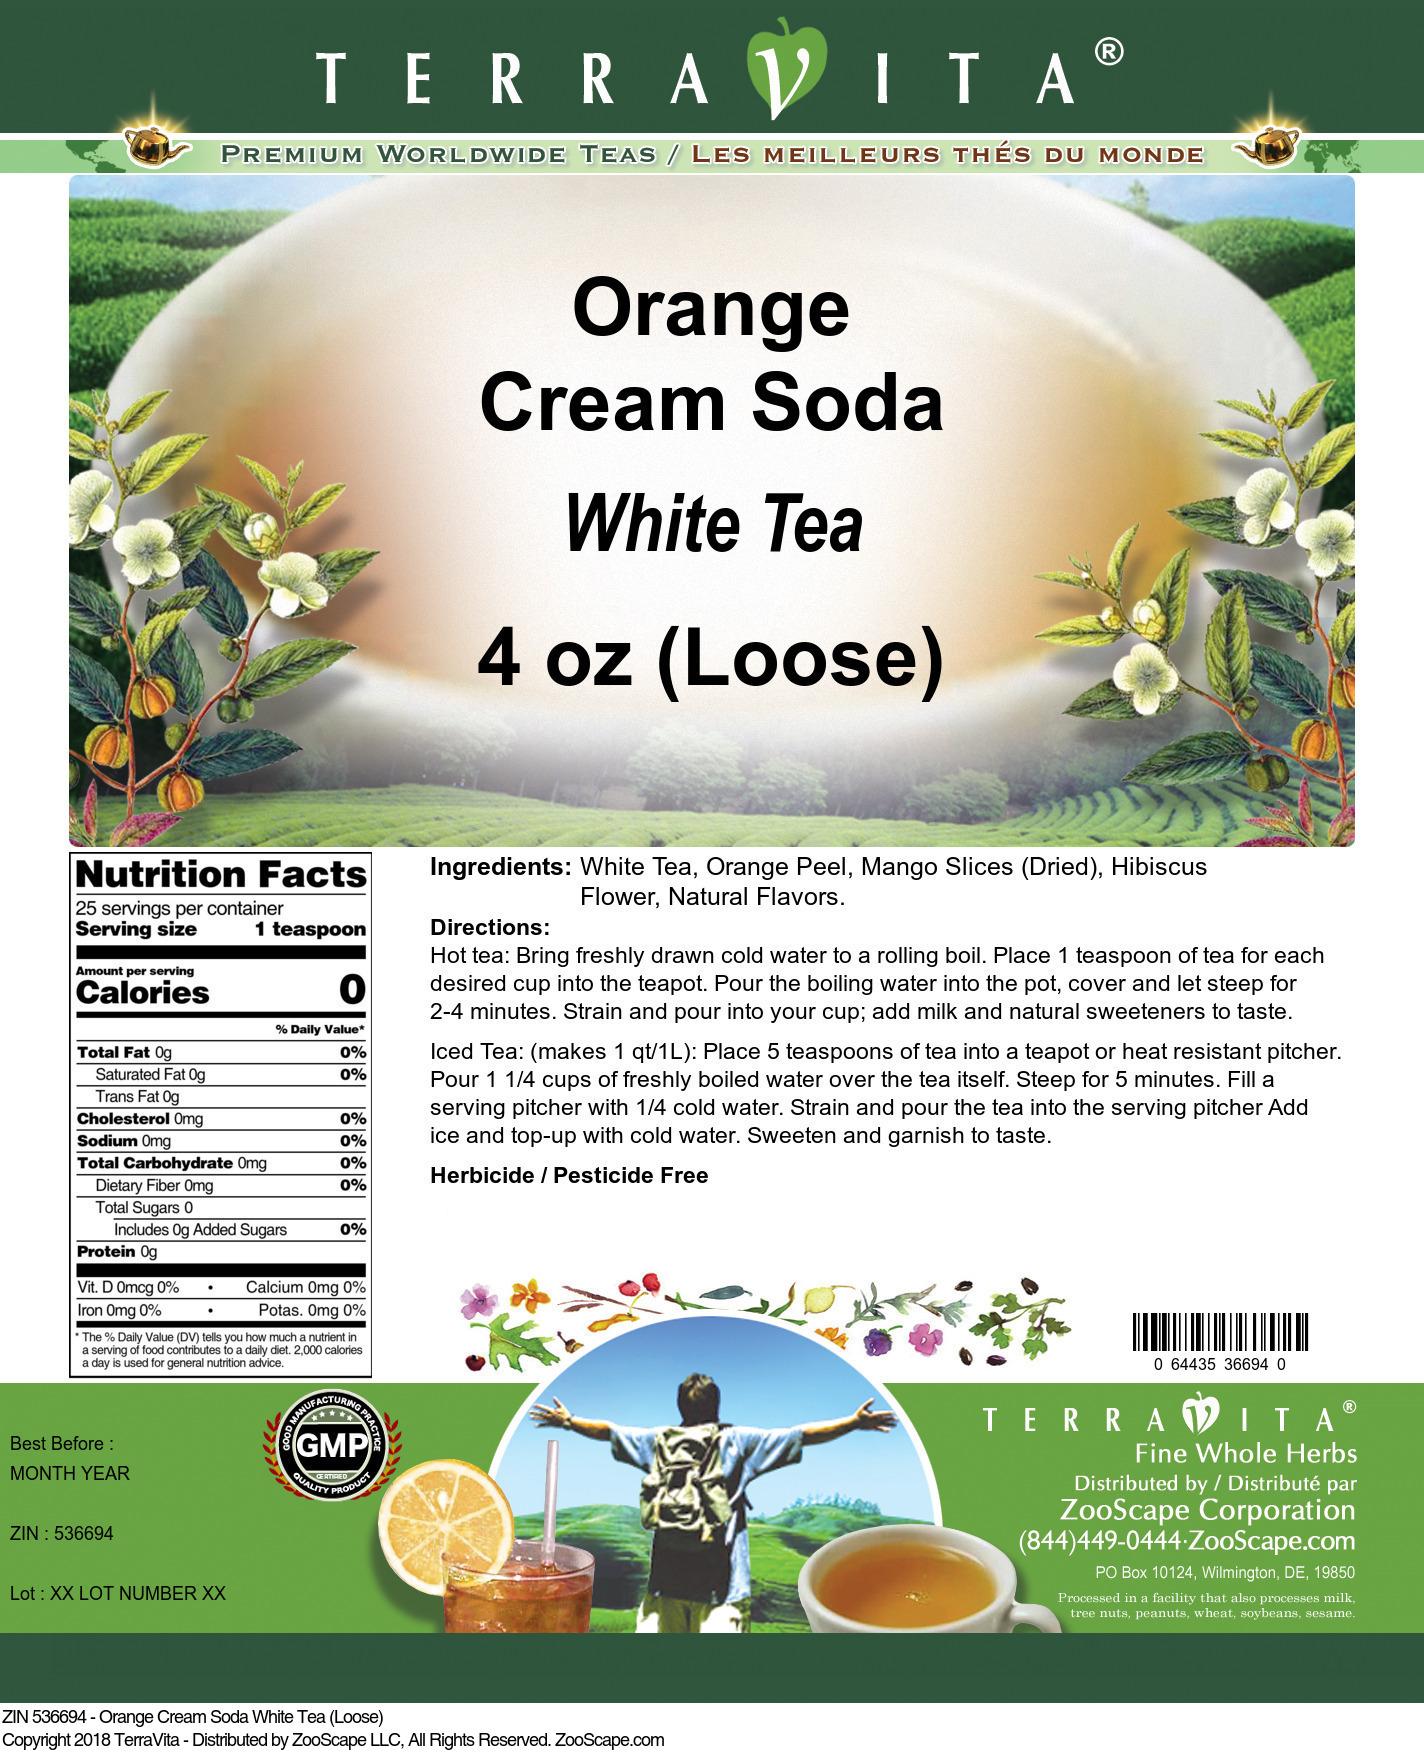 Orange Cream Soda White Tea (Loose)